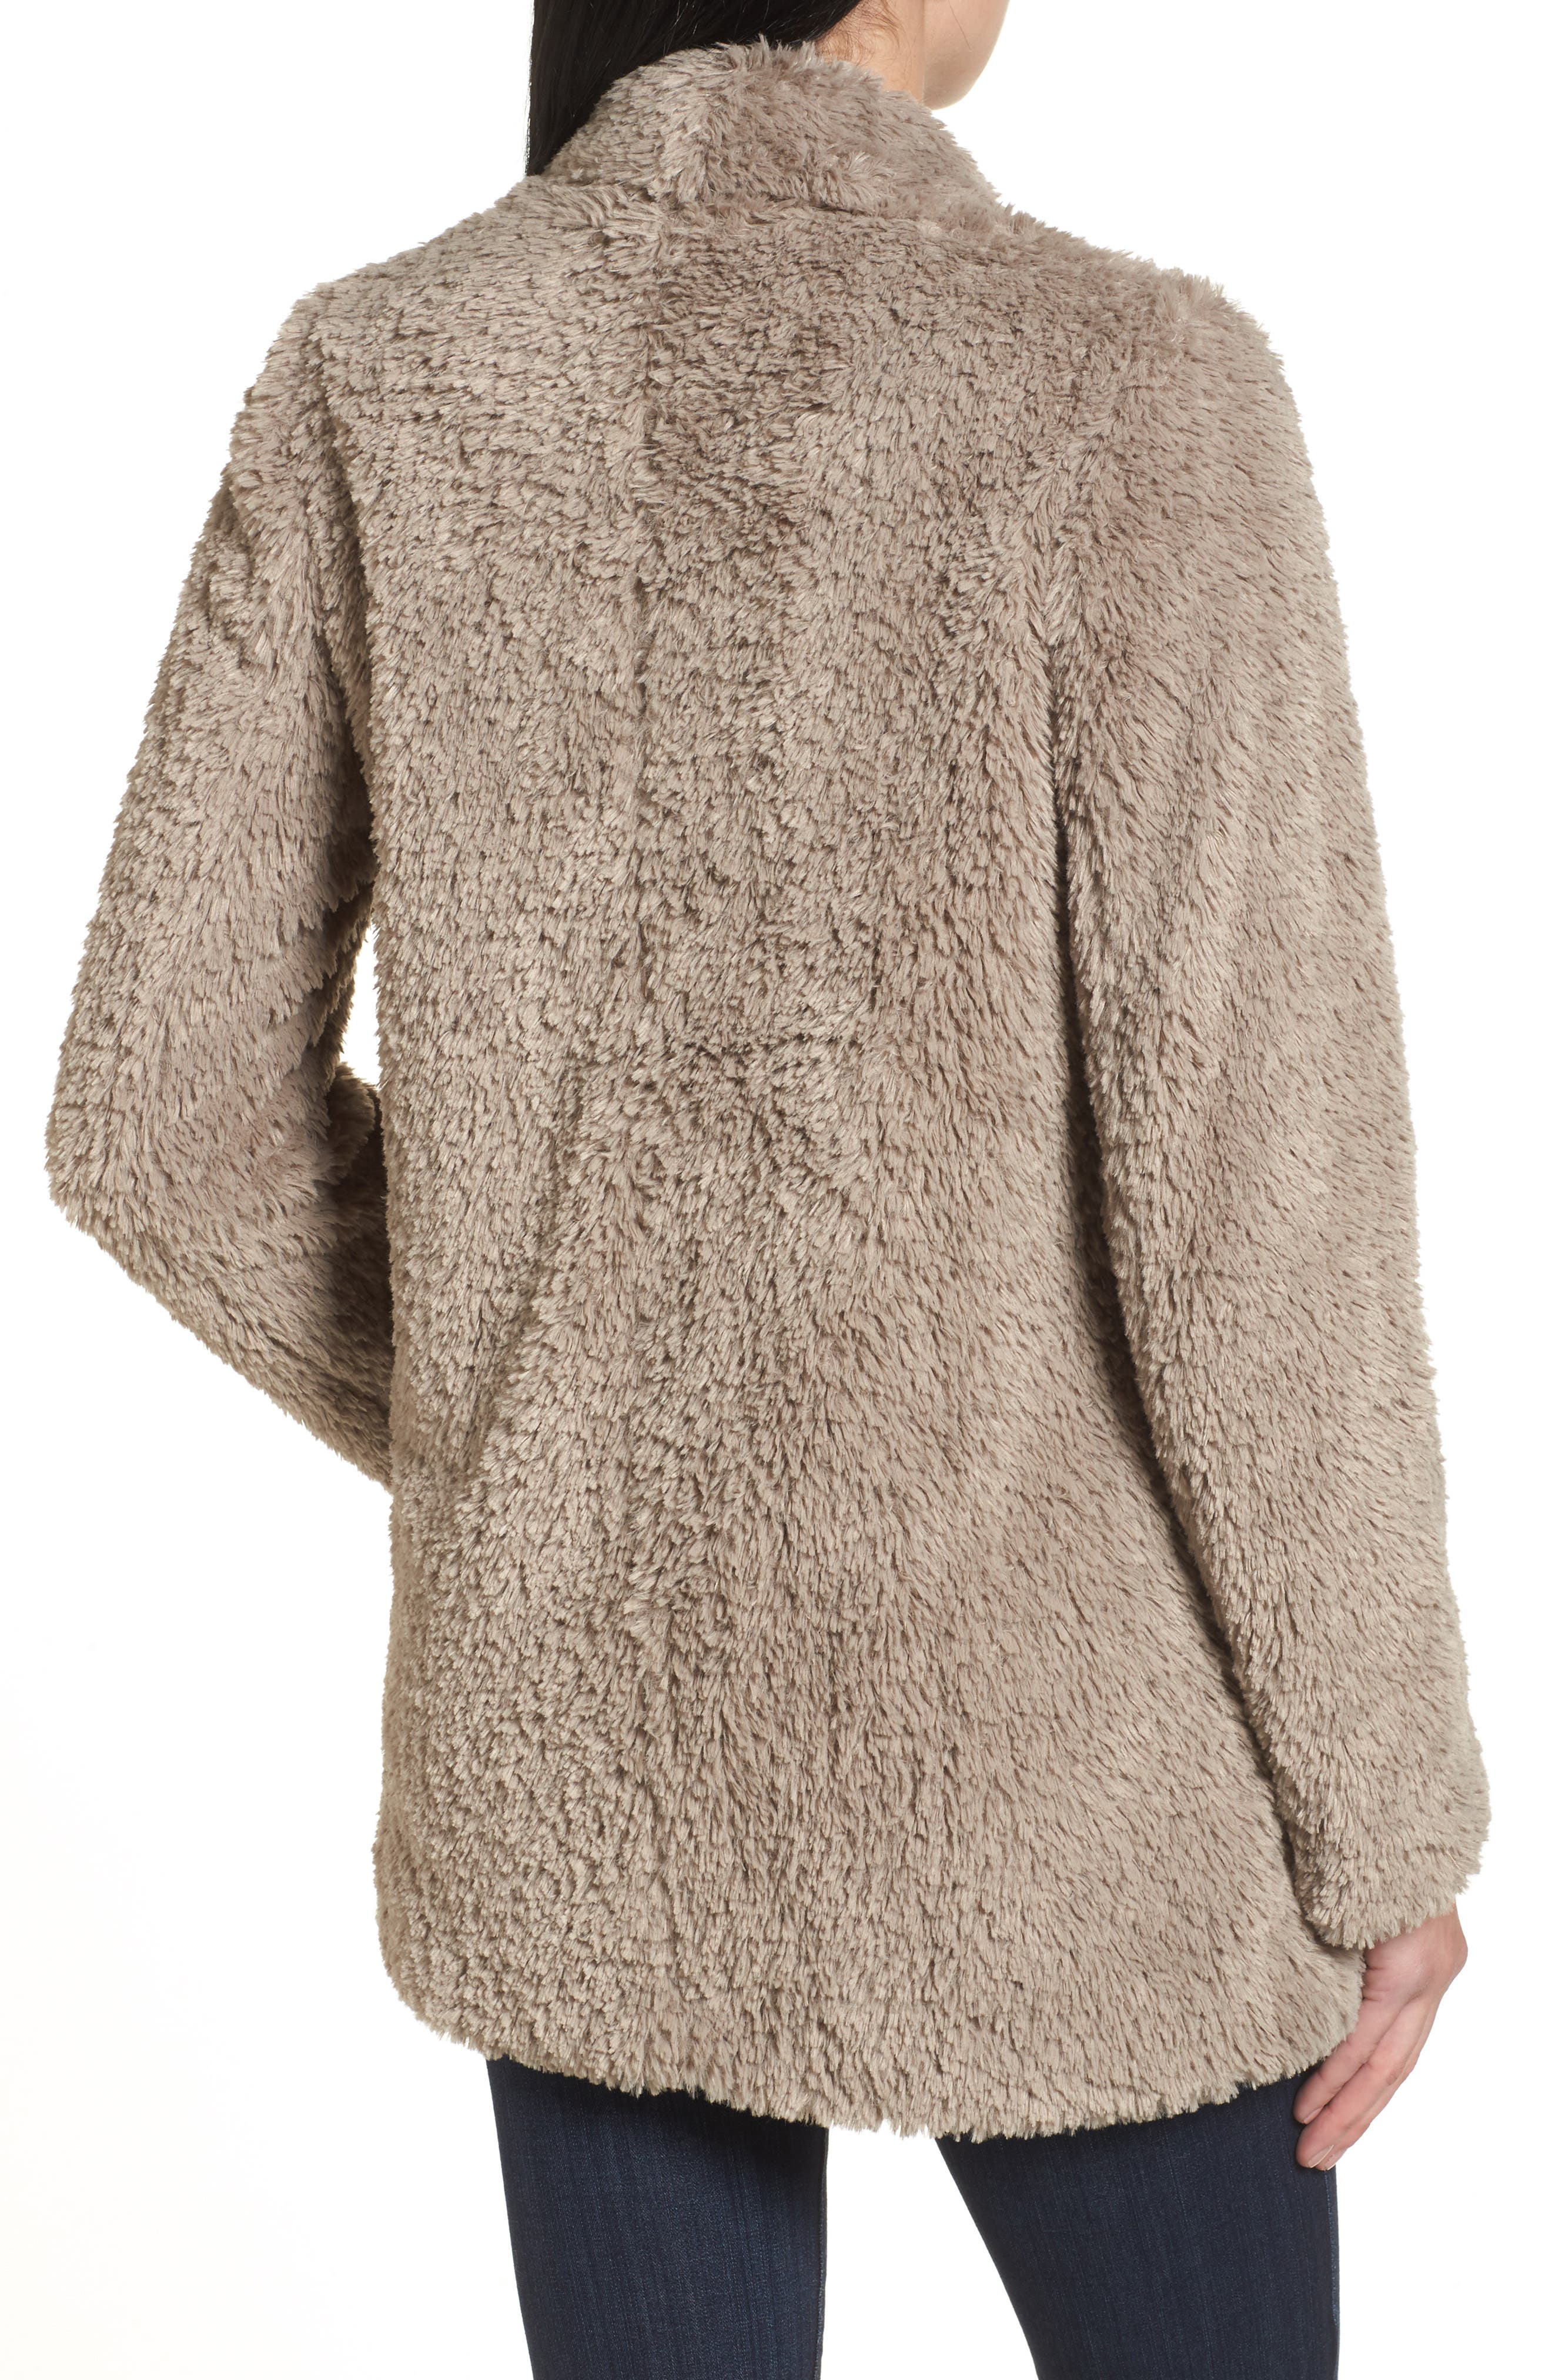 'Teddy Bear' Faux Fur Clutch Coat,                             Alternate thumbnail 2, color,                             254